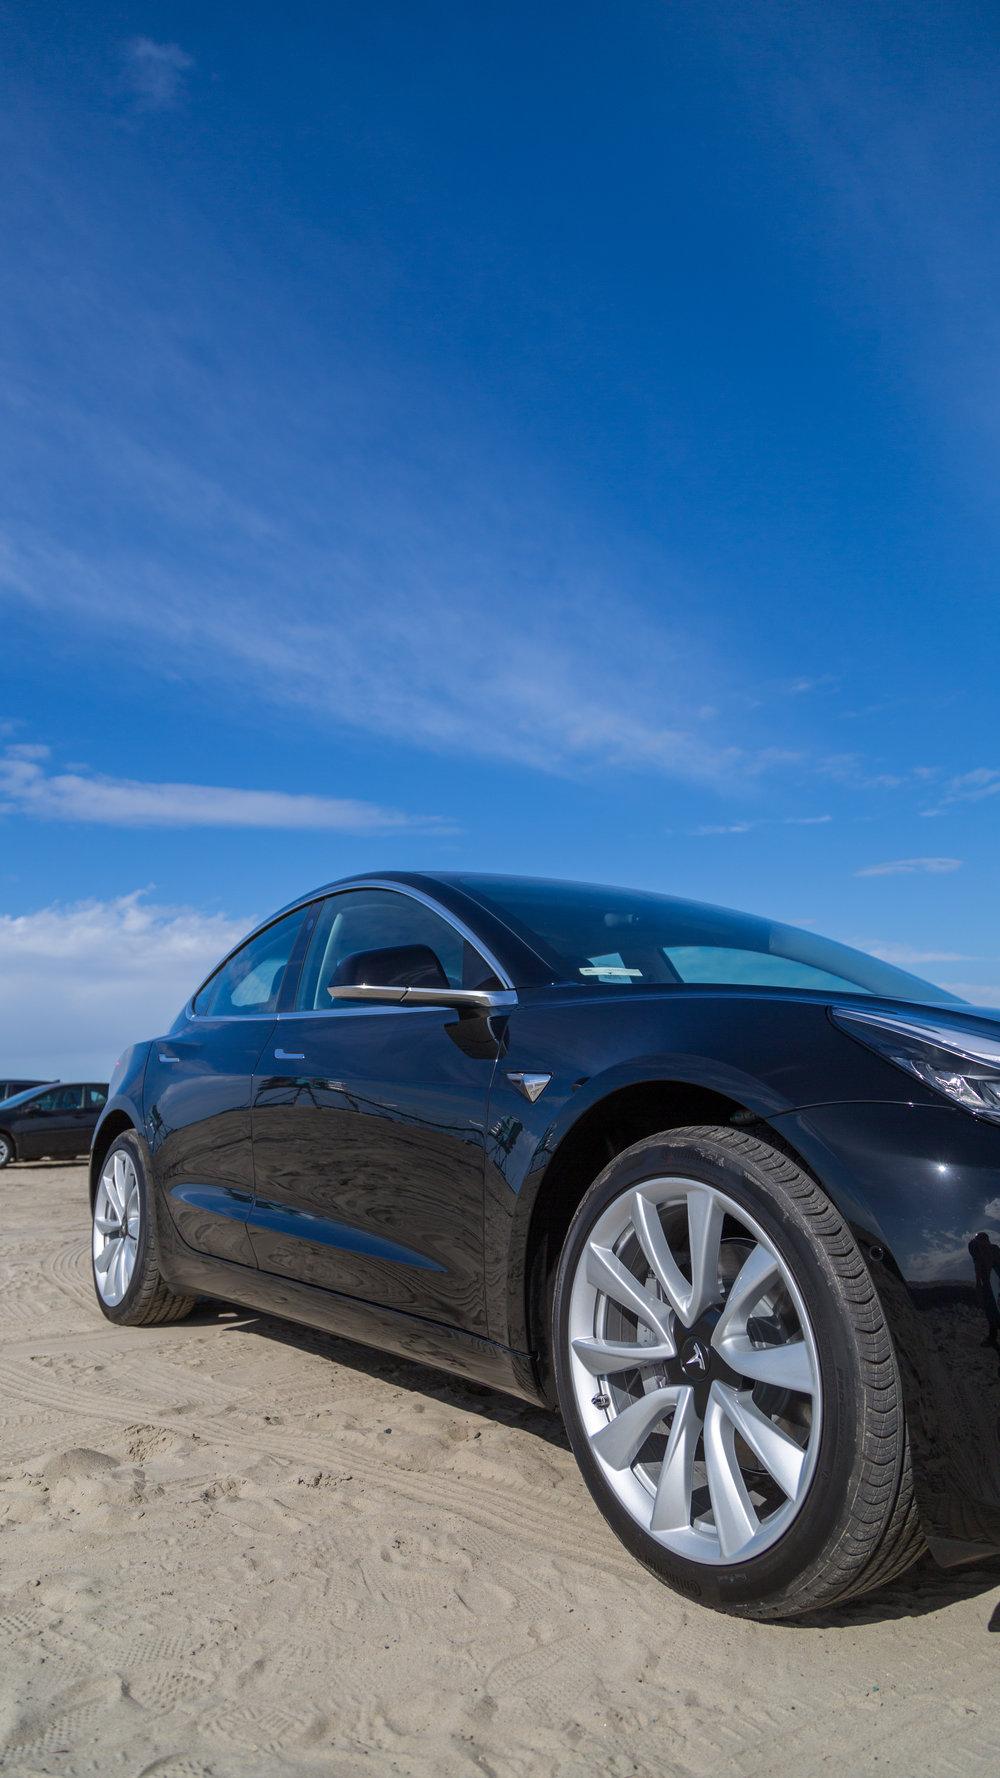 2018-02-20 Tesla Model 3 Review by Caleb Wojcik-05.jpg